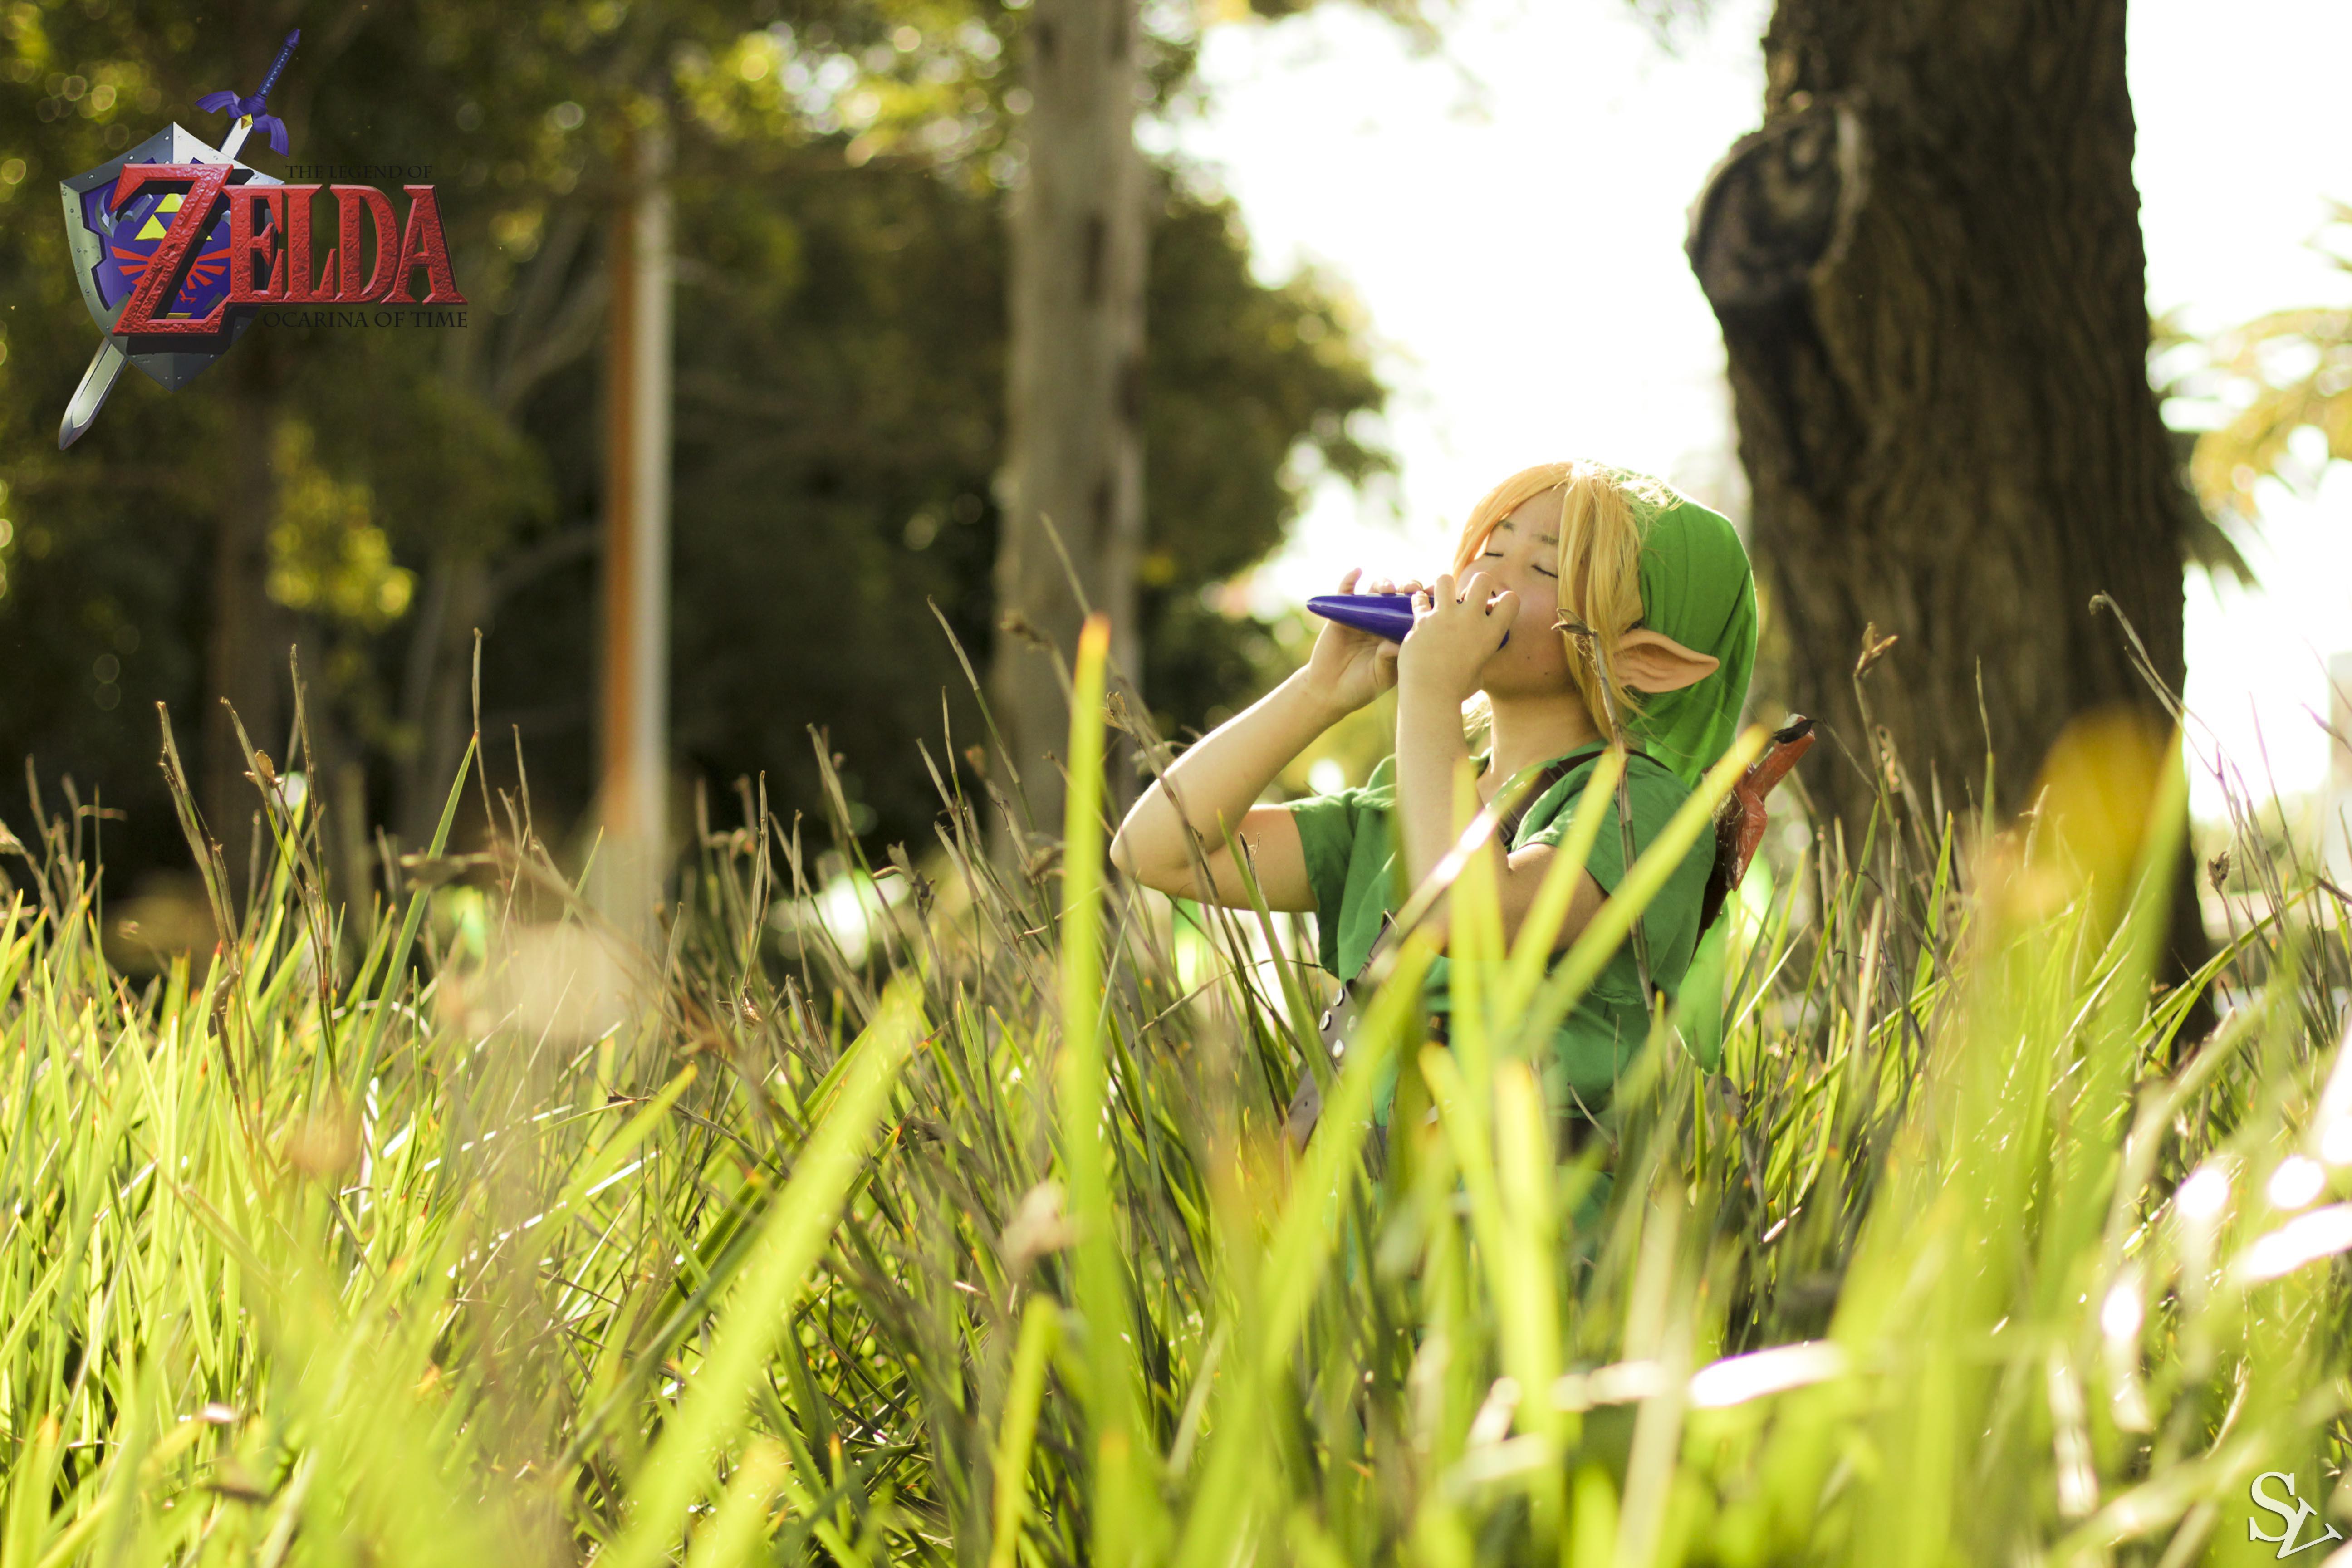 Legend of Zelda: Link in the wild by SteveFattyVuong